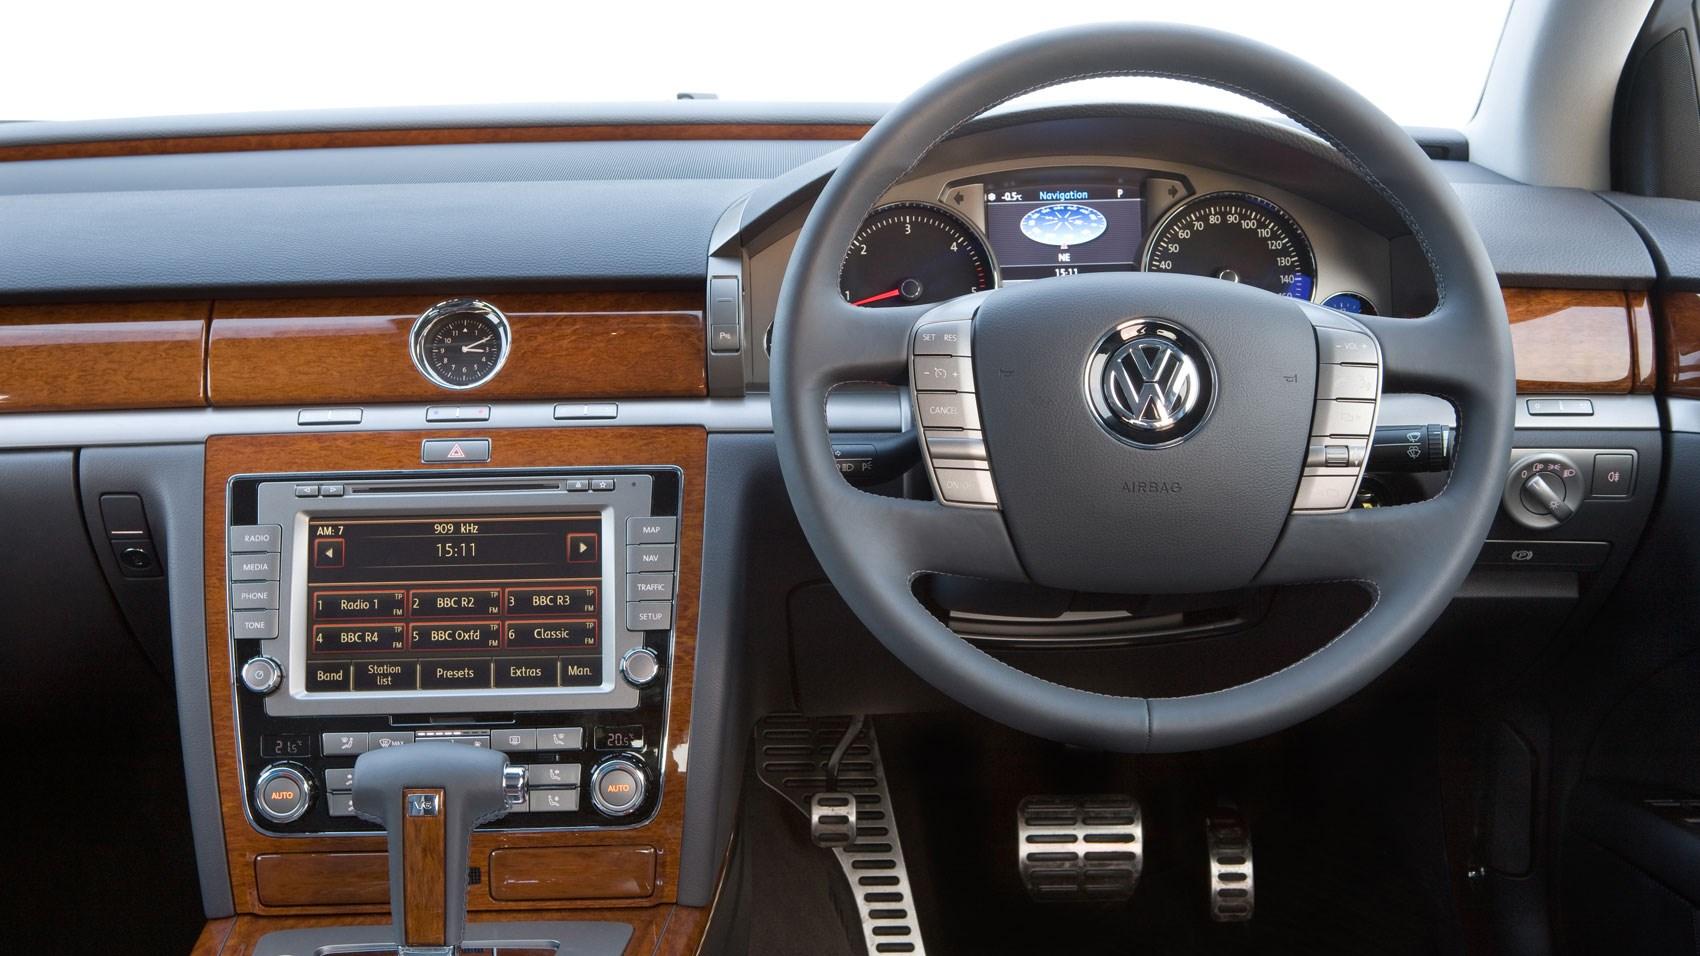 VW Phaeton 3.0 V6 TDI LWB (2015) review | CAR Magazine